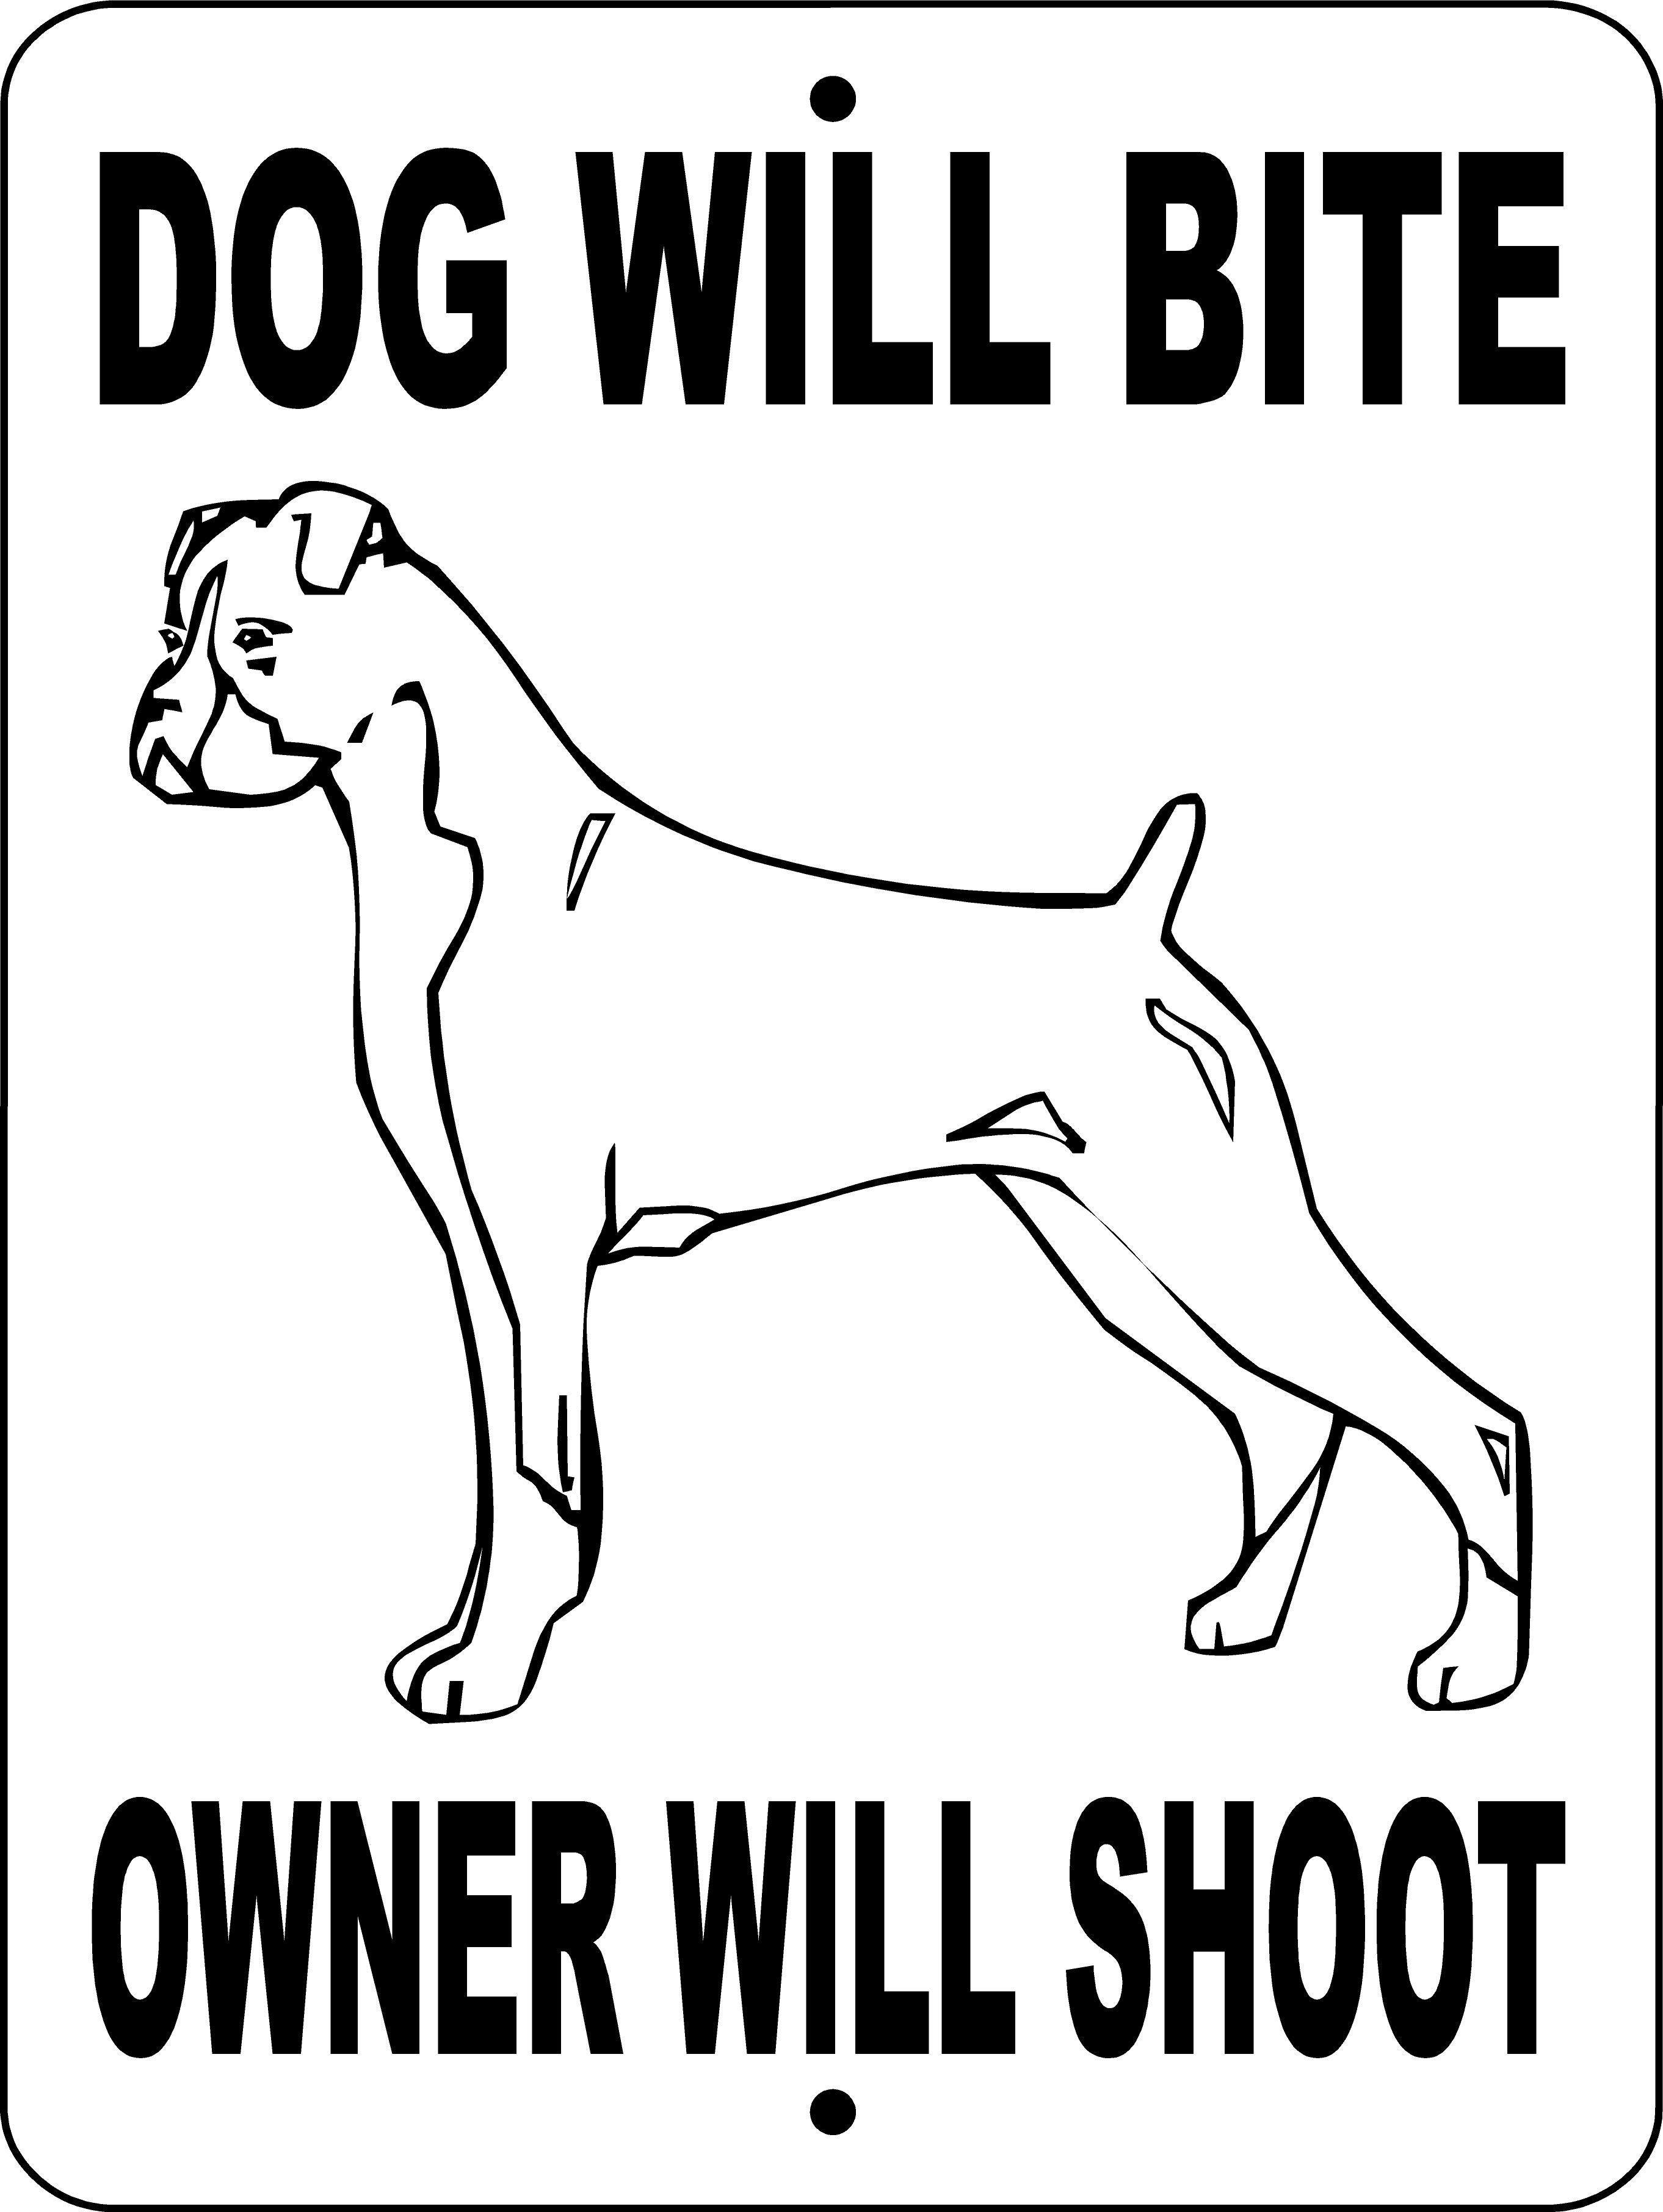 Boxer dog sign dwbowsbx | Pinterest | Dog, Doggies and Animal